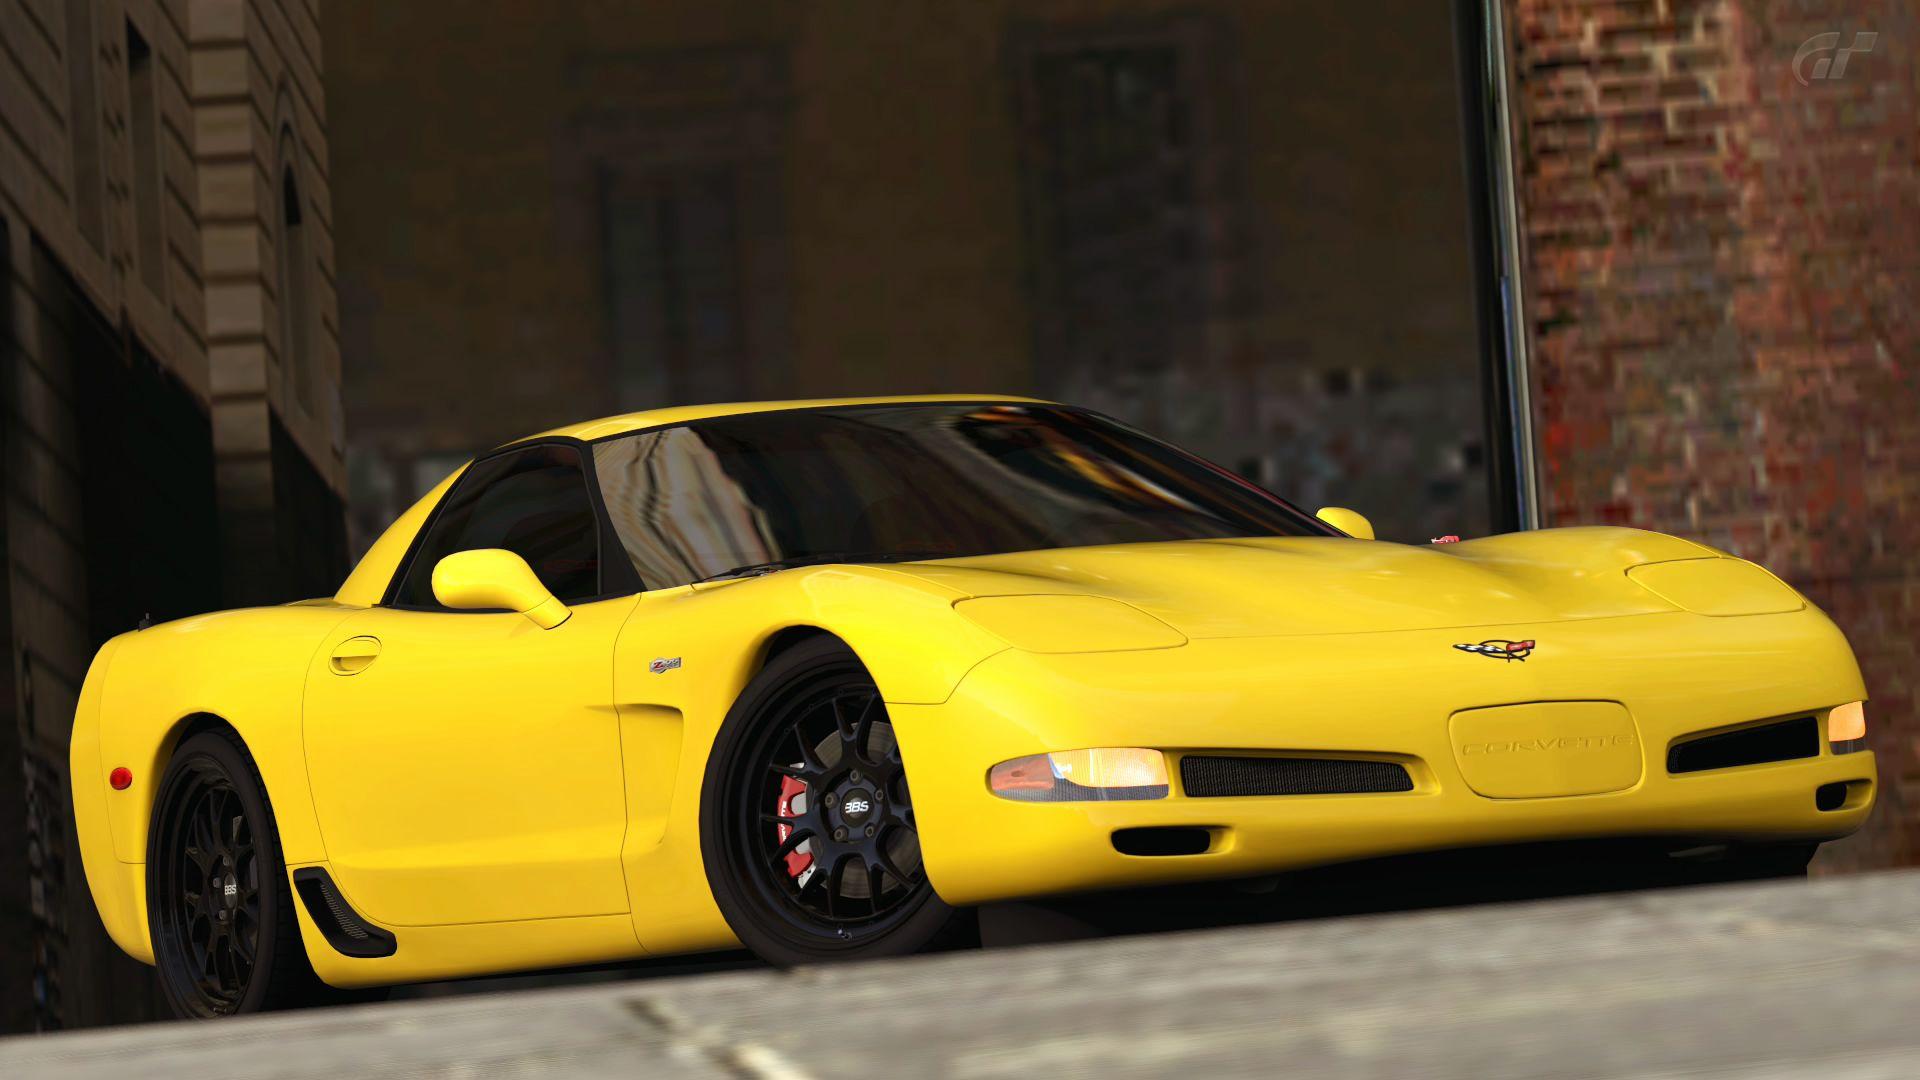 Image For Car Review Of Chevrolet Corvette Z06 2004 Chevrolet Corvette Chevrolet Corvette Z06 Corvette